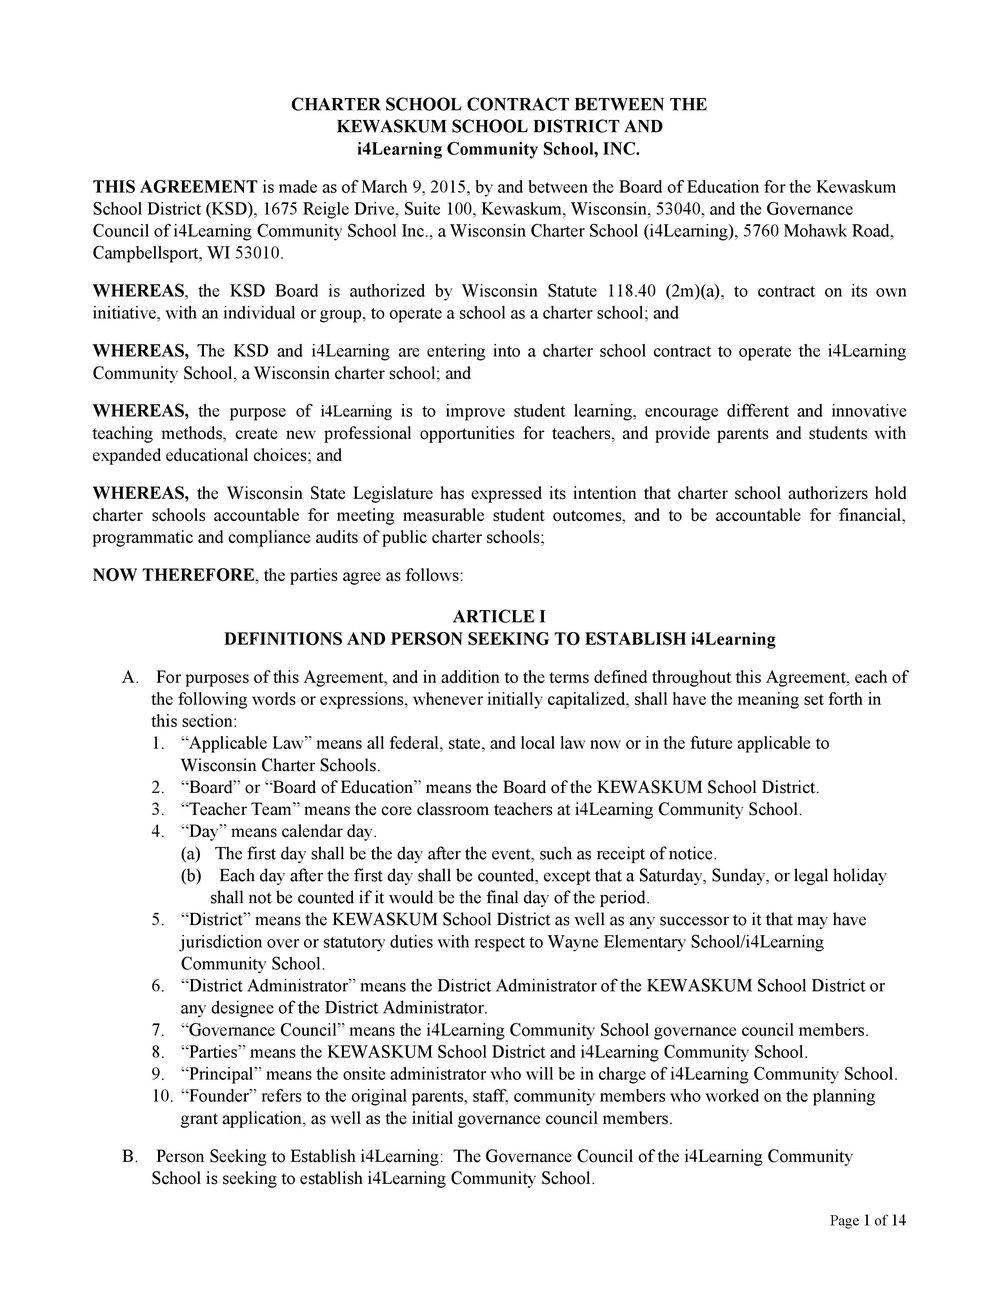 Contract pg 1.jpg